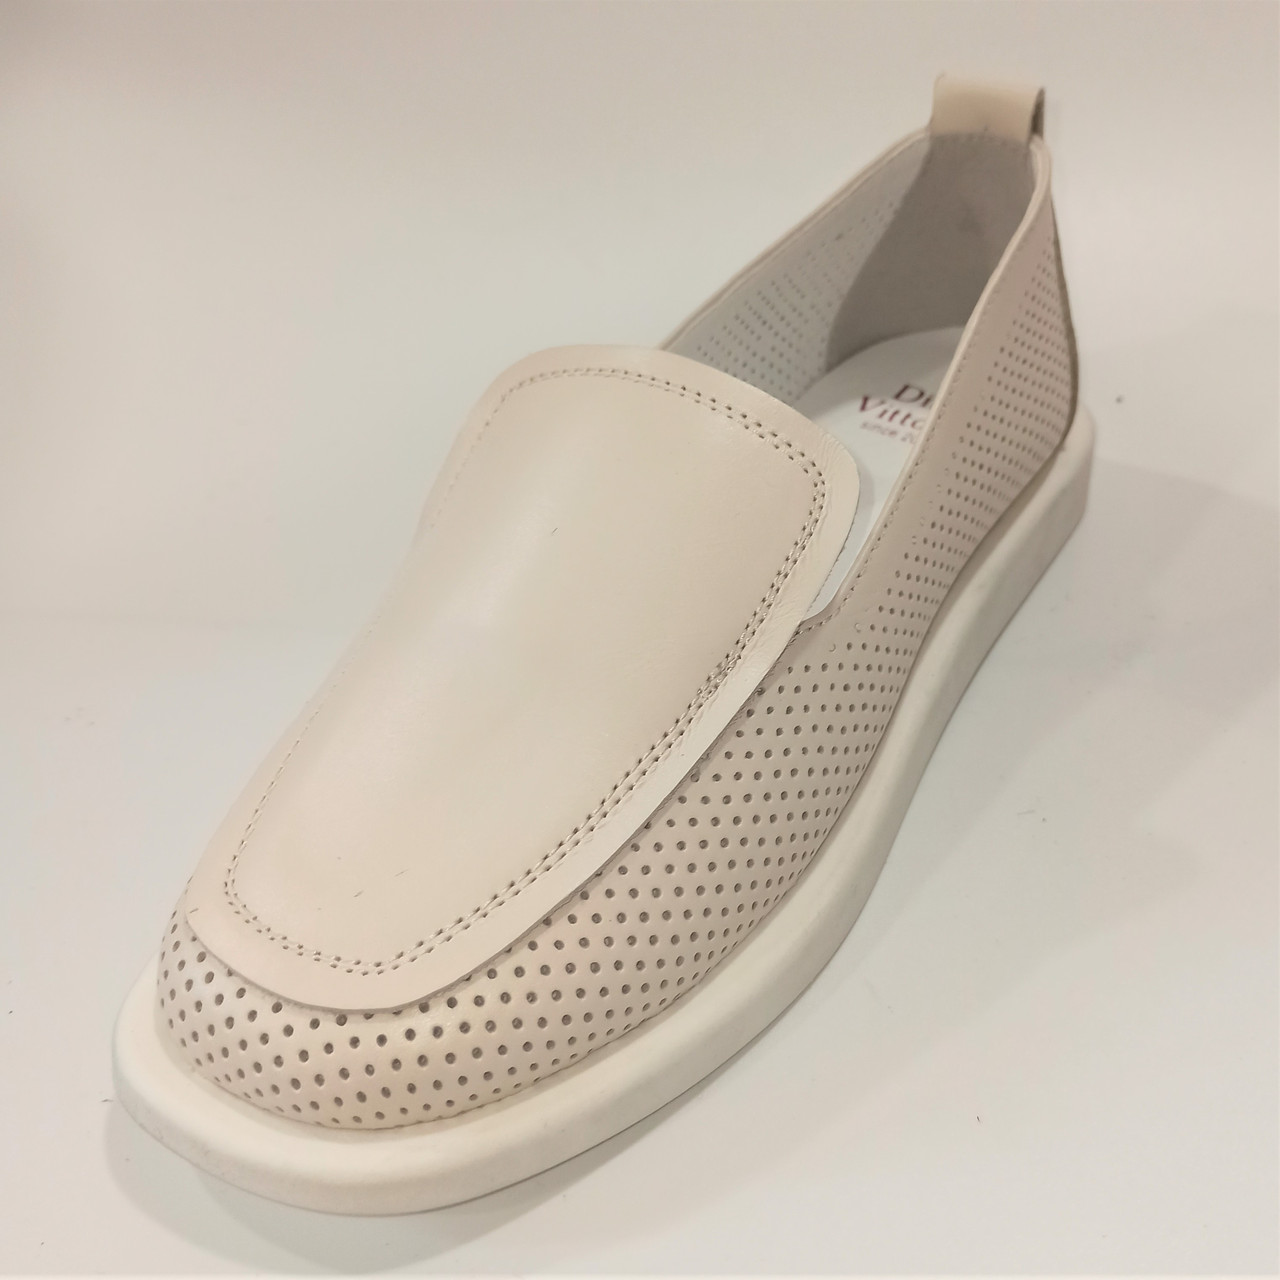 Стильные женские бежевые туфли, Dino Vittorio размеры: 36-39